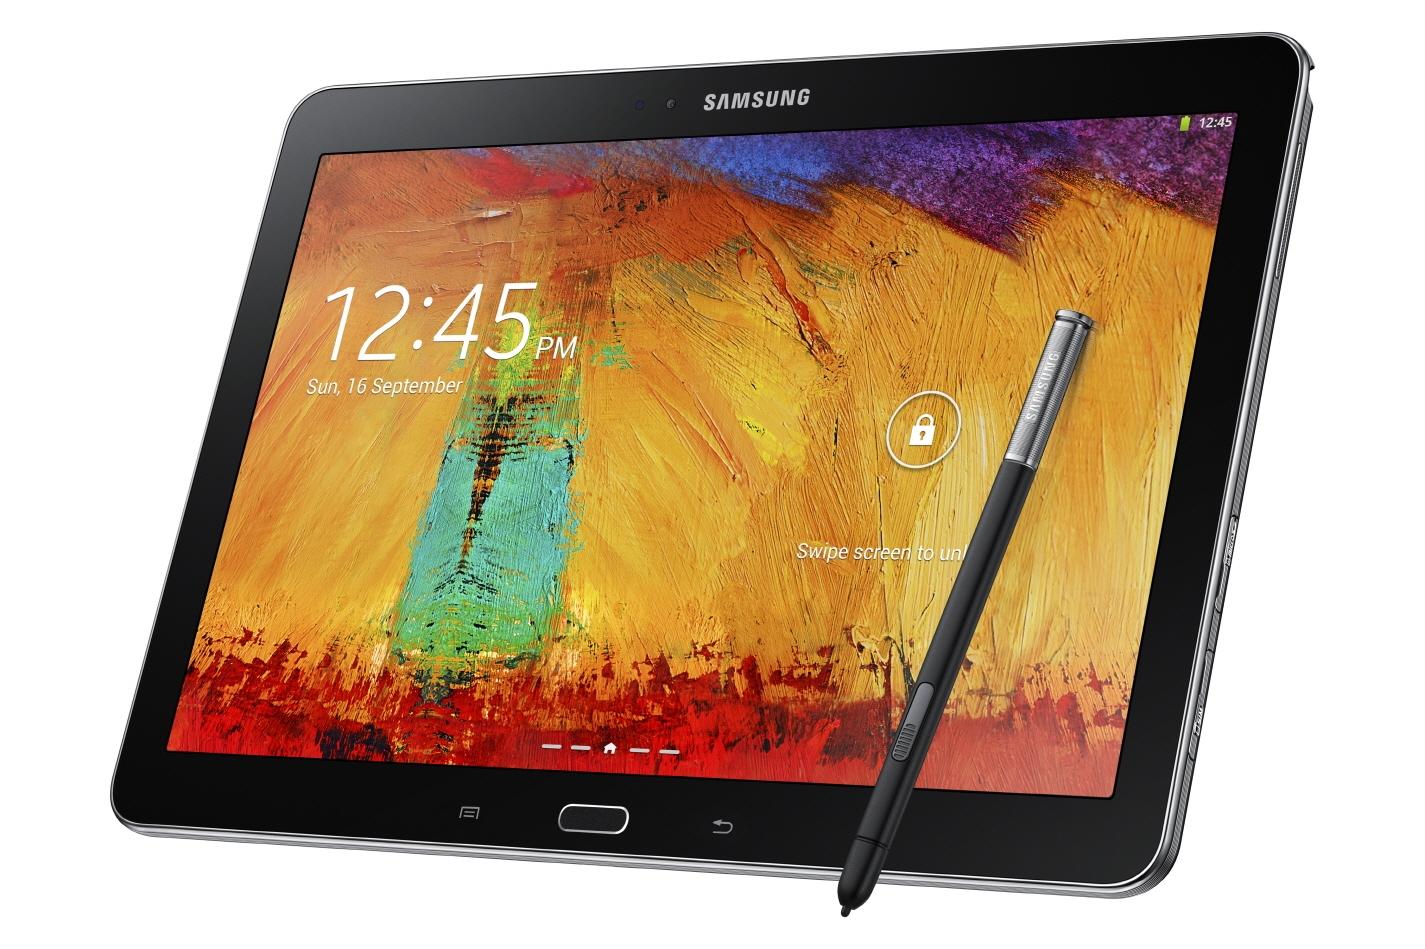 Samsung Galaxy Note 10.1 (2014) - черного цвета